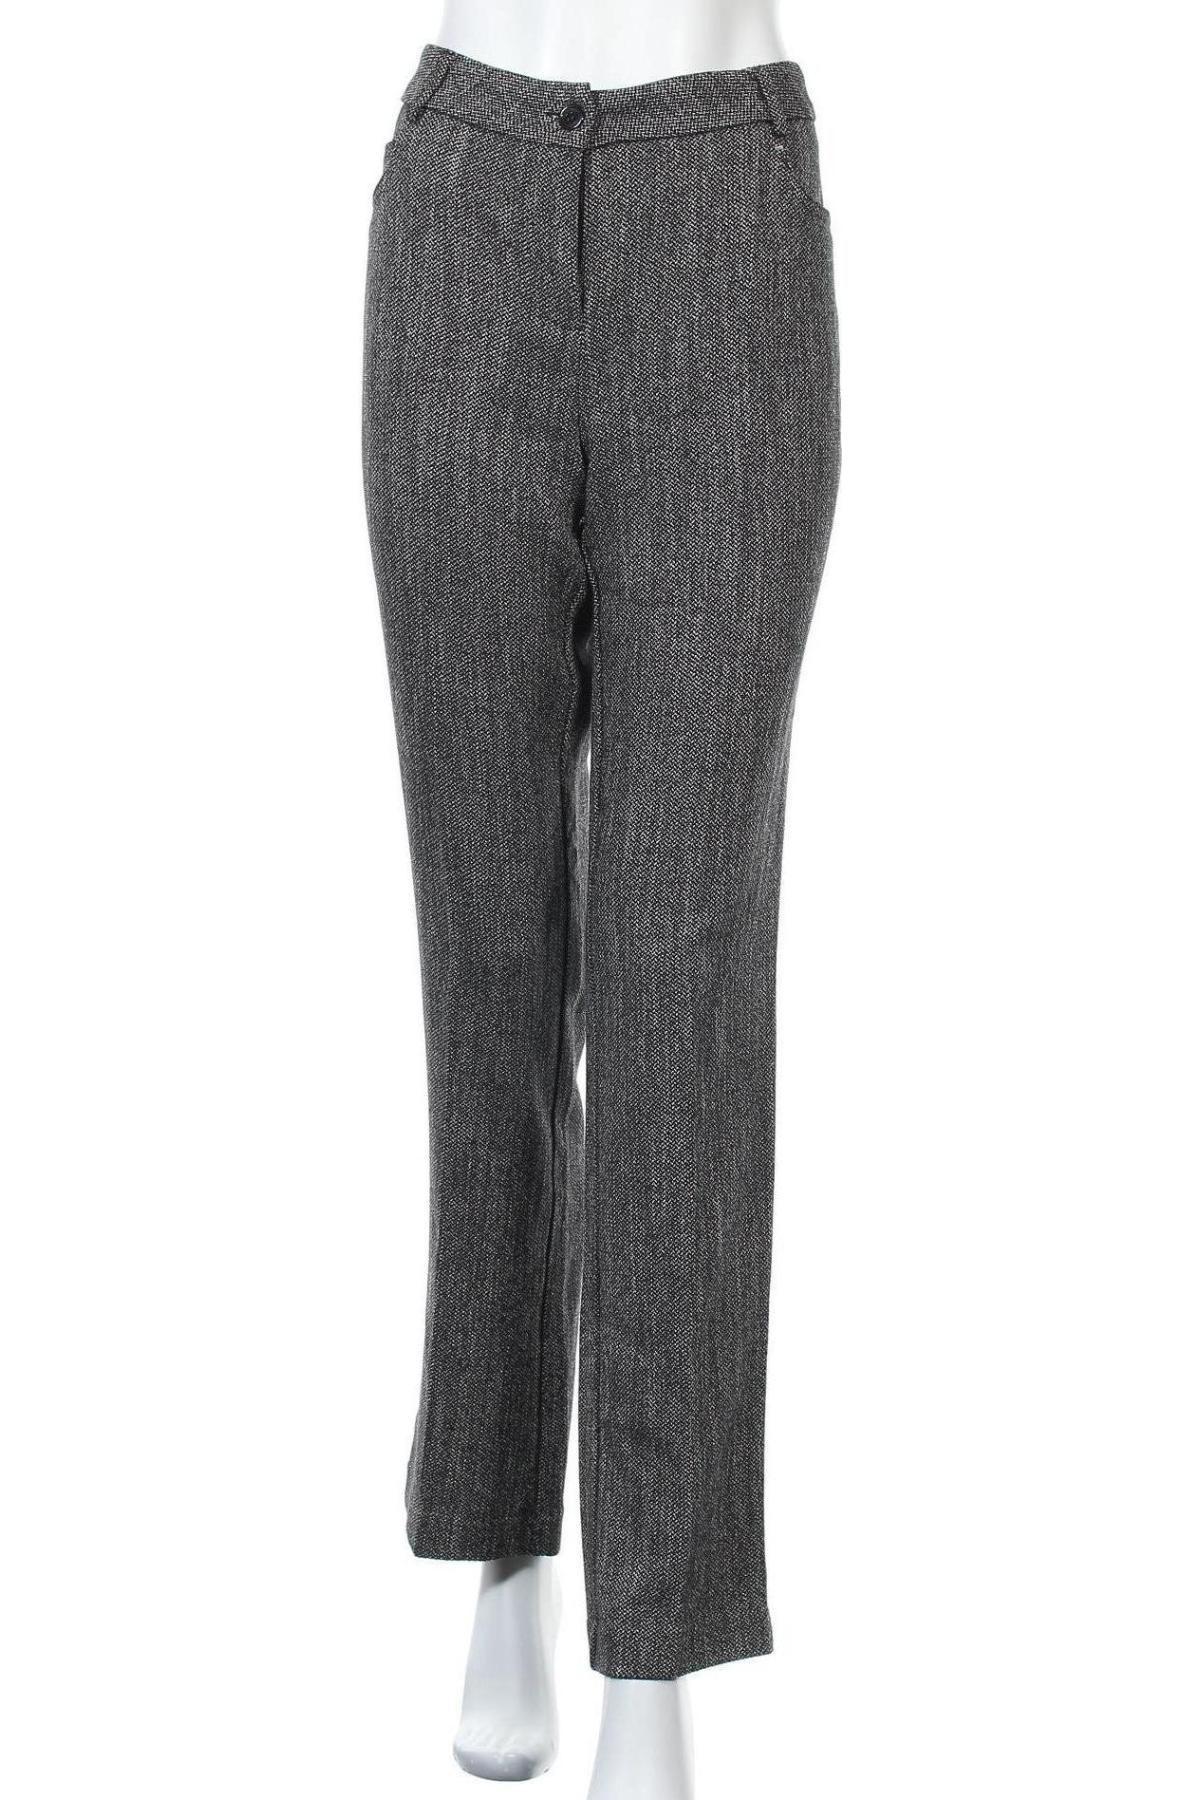 Дамски панталон Camomilla, Размер XL, Цвят Сив, 52% полиестер, 47% вискоза, 1% еластан, Цена 15,56лв.